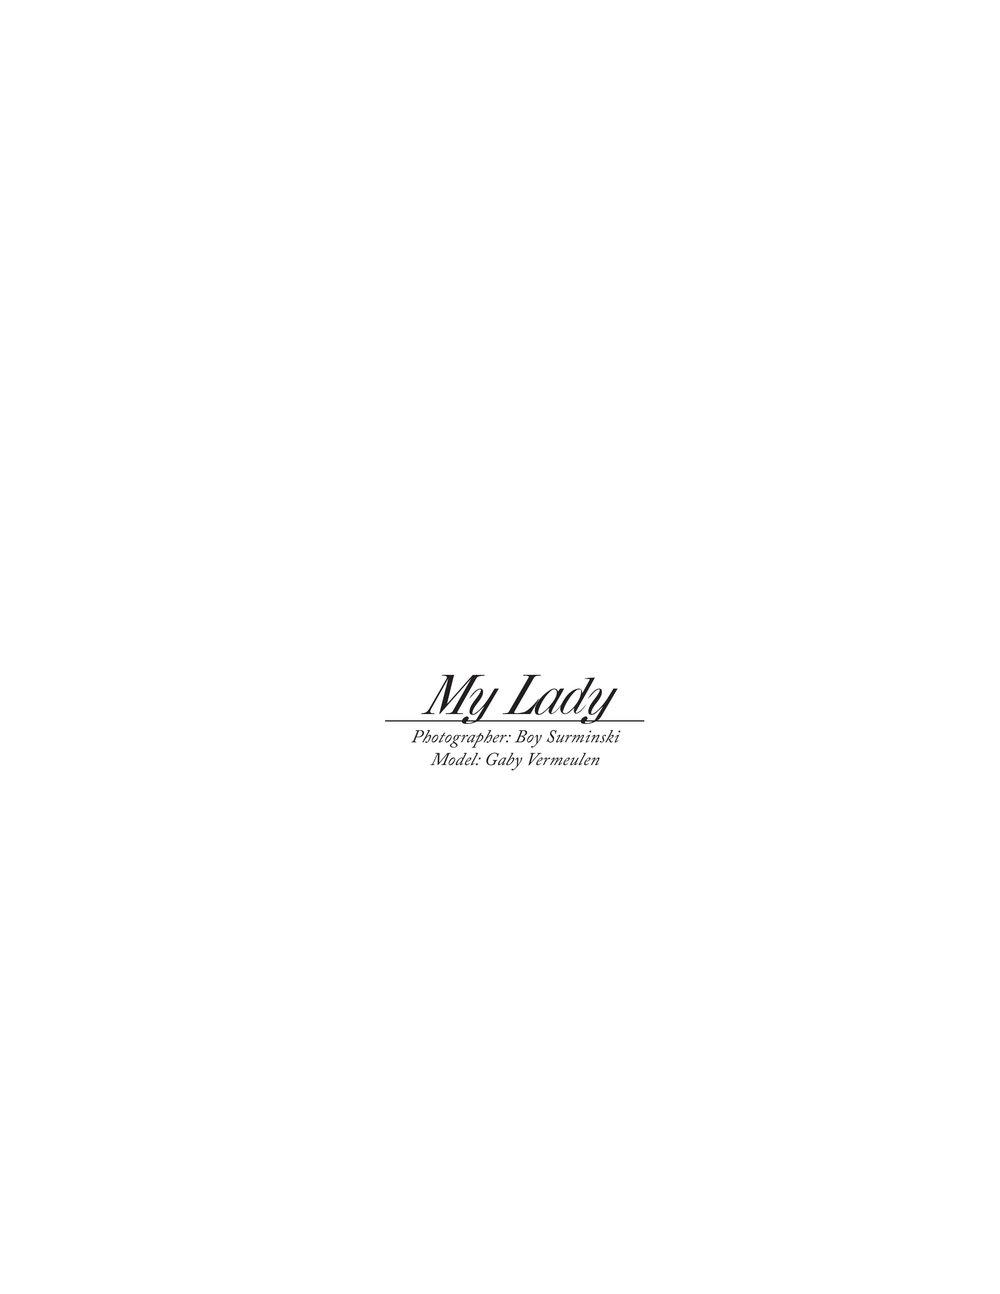 My Lady-page-004.jpg